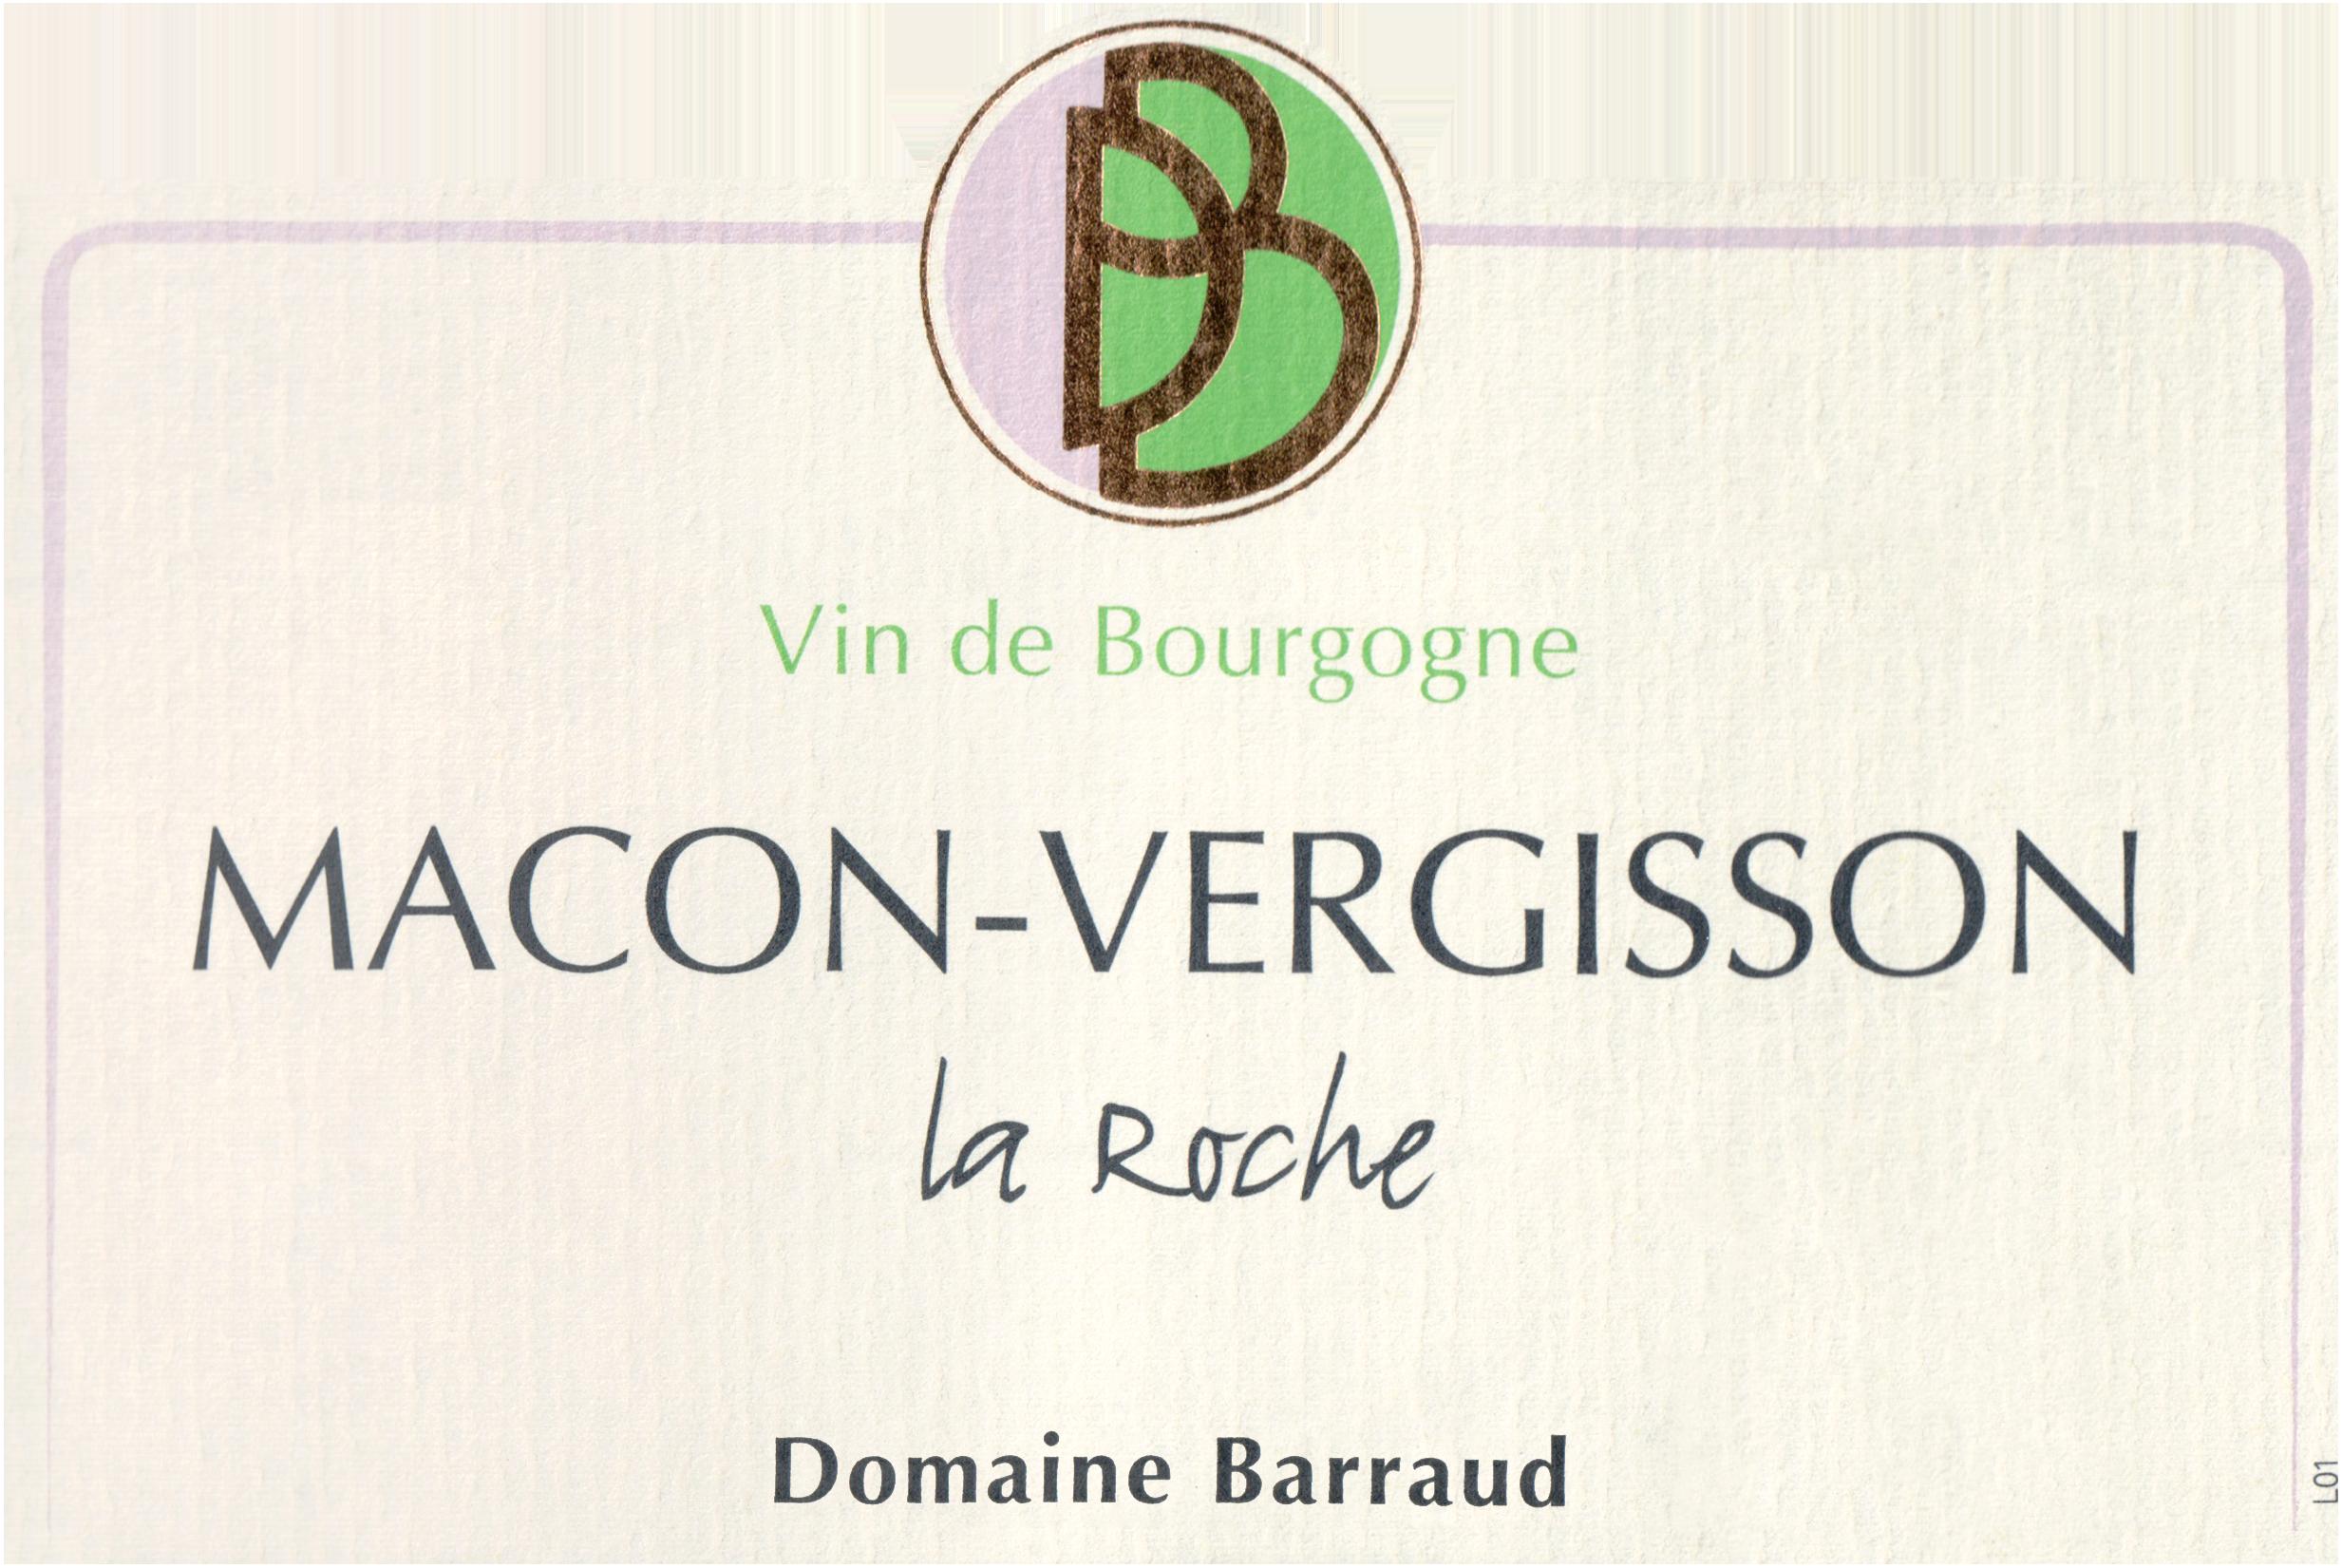 Daniel & Julien Barraud Macon Vergisson La Roche 2018